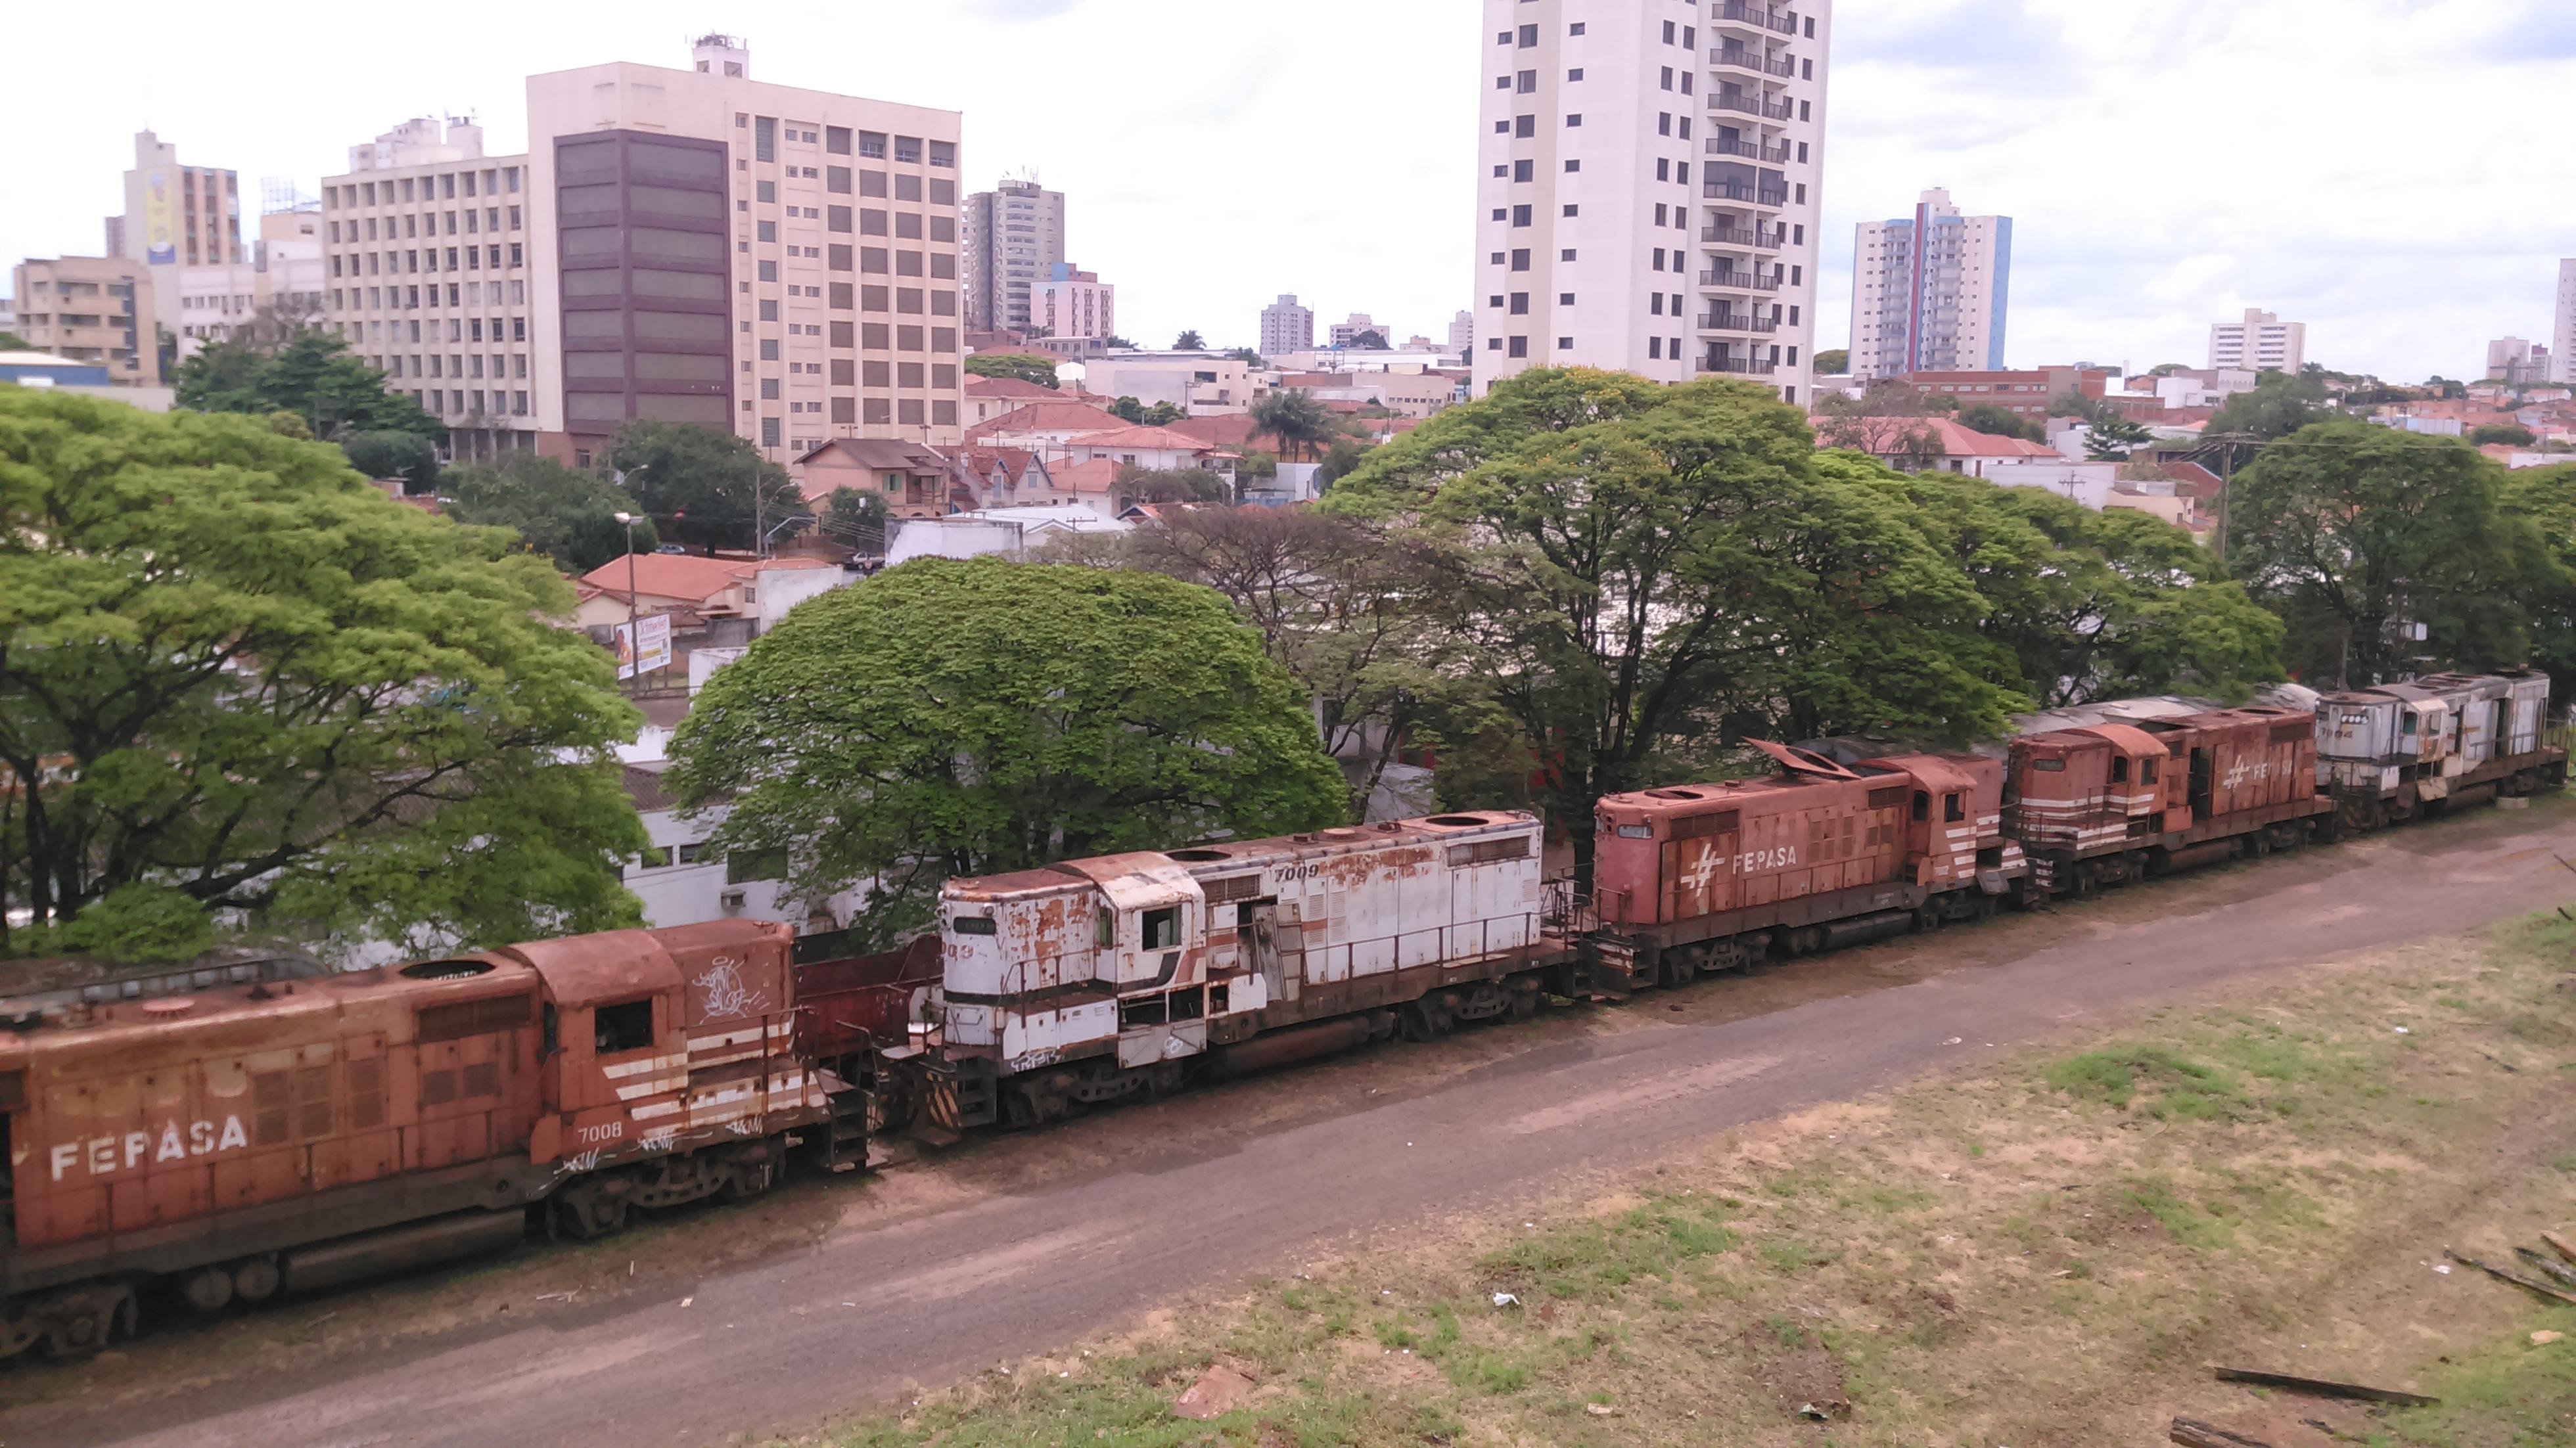 FileEstao Ferroviria Araraquara 5